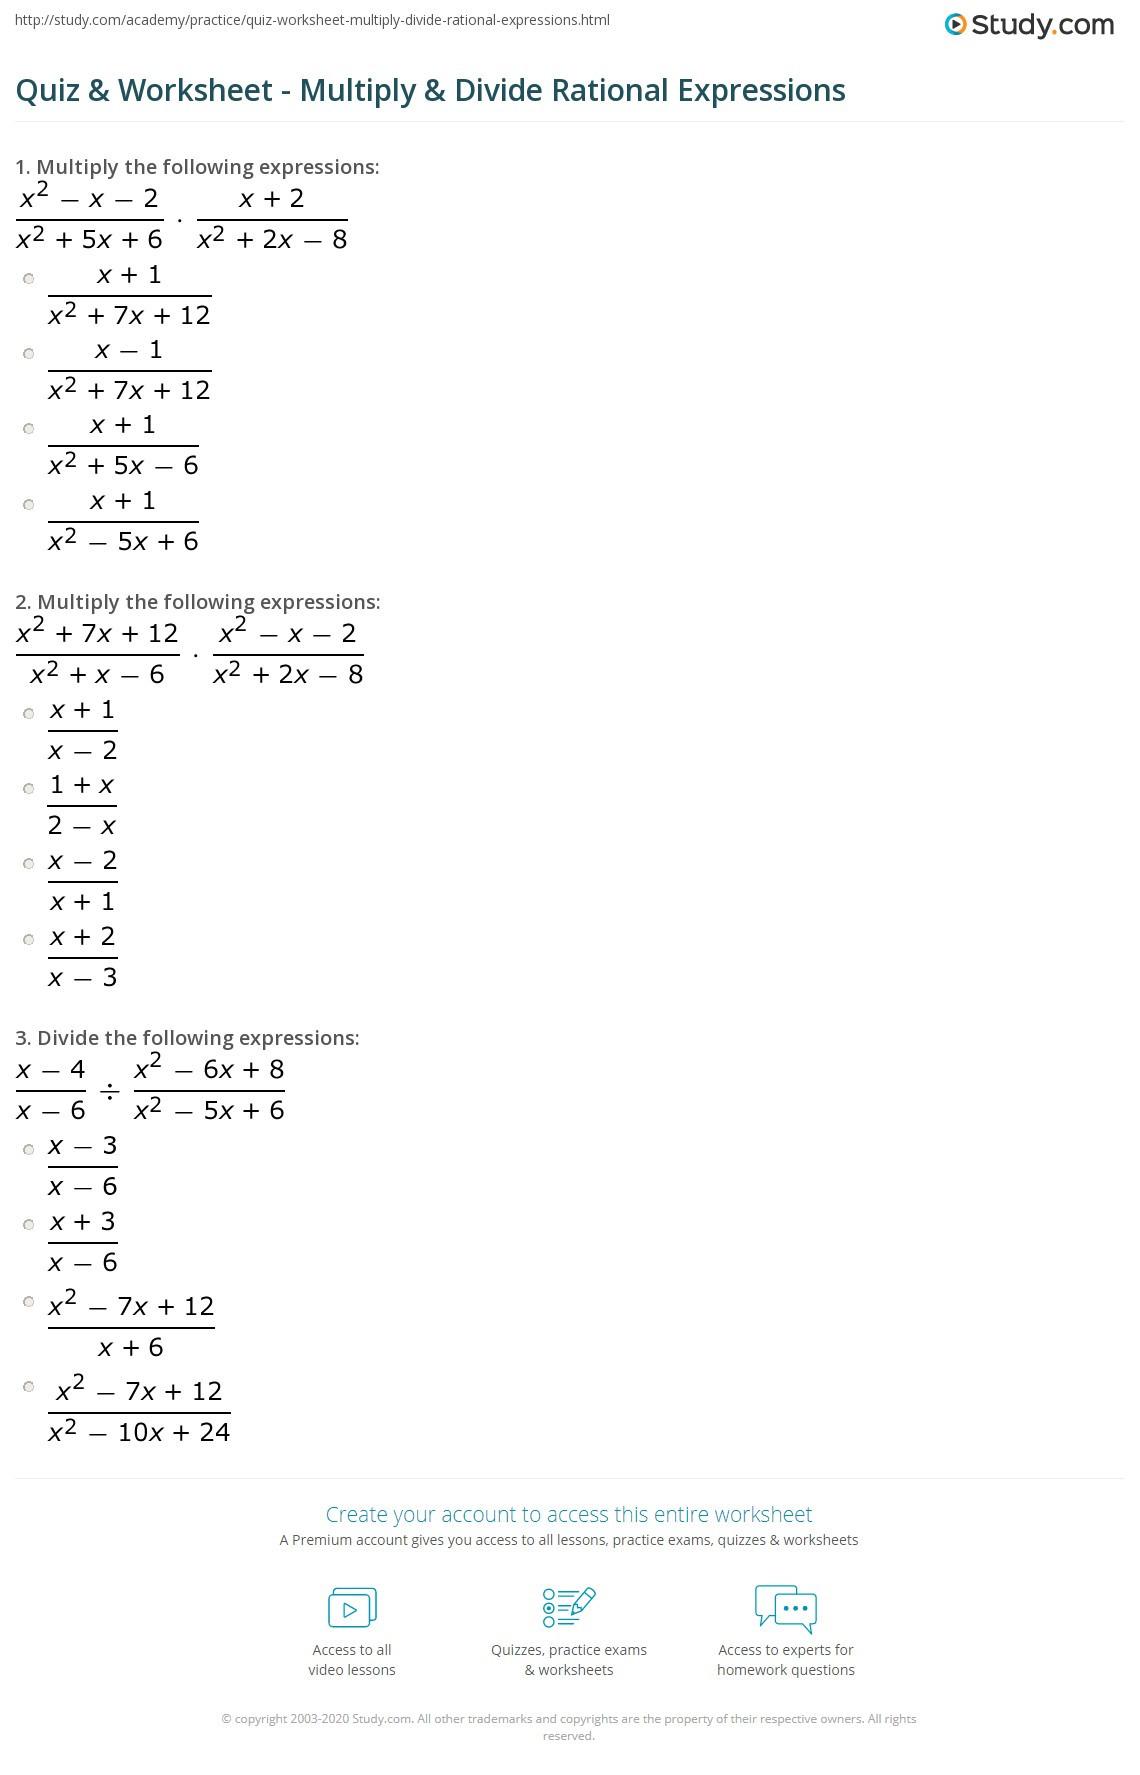 Multiplying Rational Expressions Worksheet Quiz & Worksheet Multiply & Divide Rational Expressions